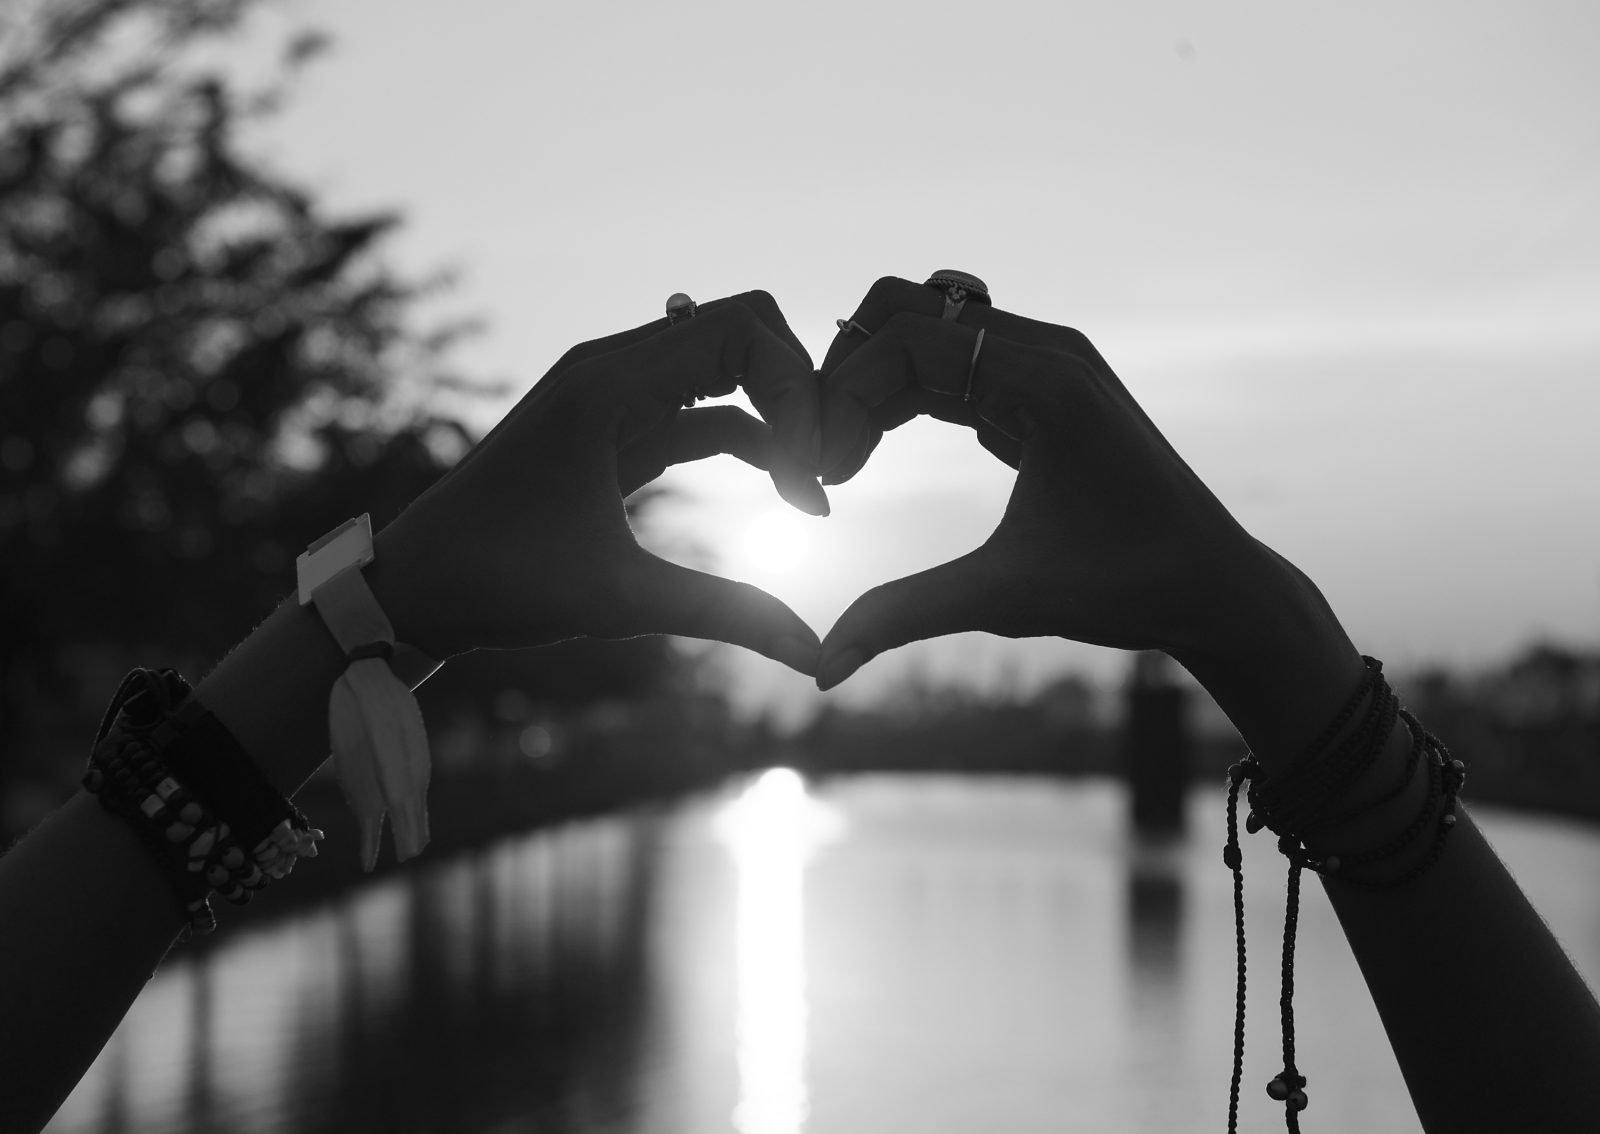 Pictures of heart hands